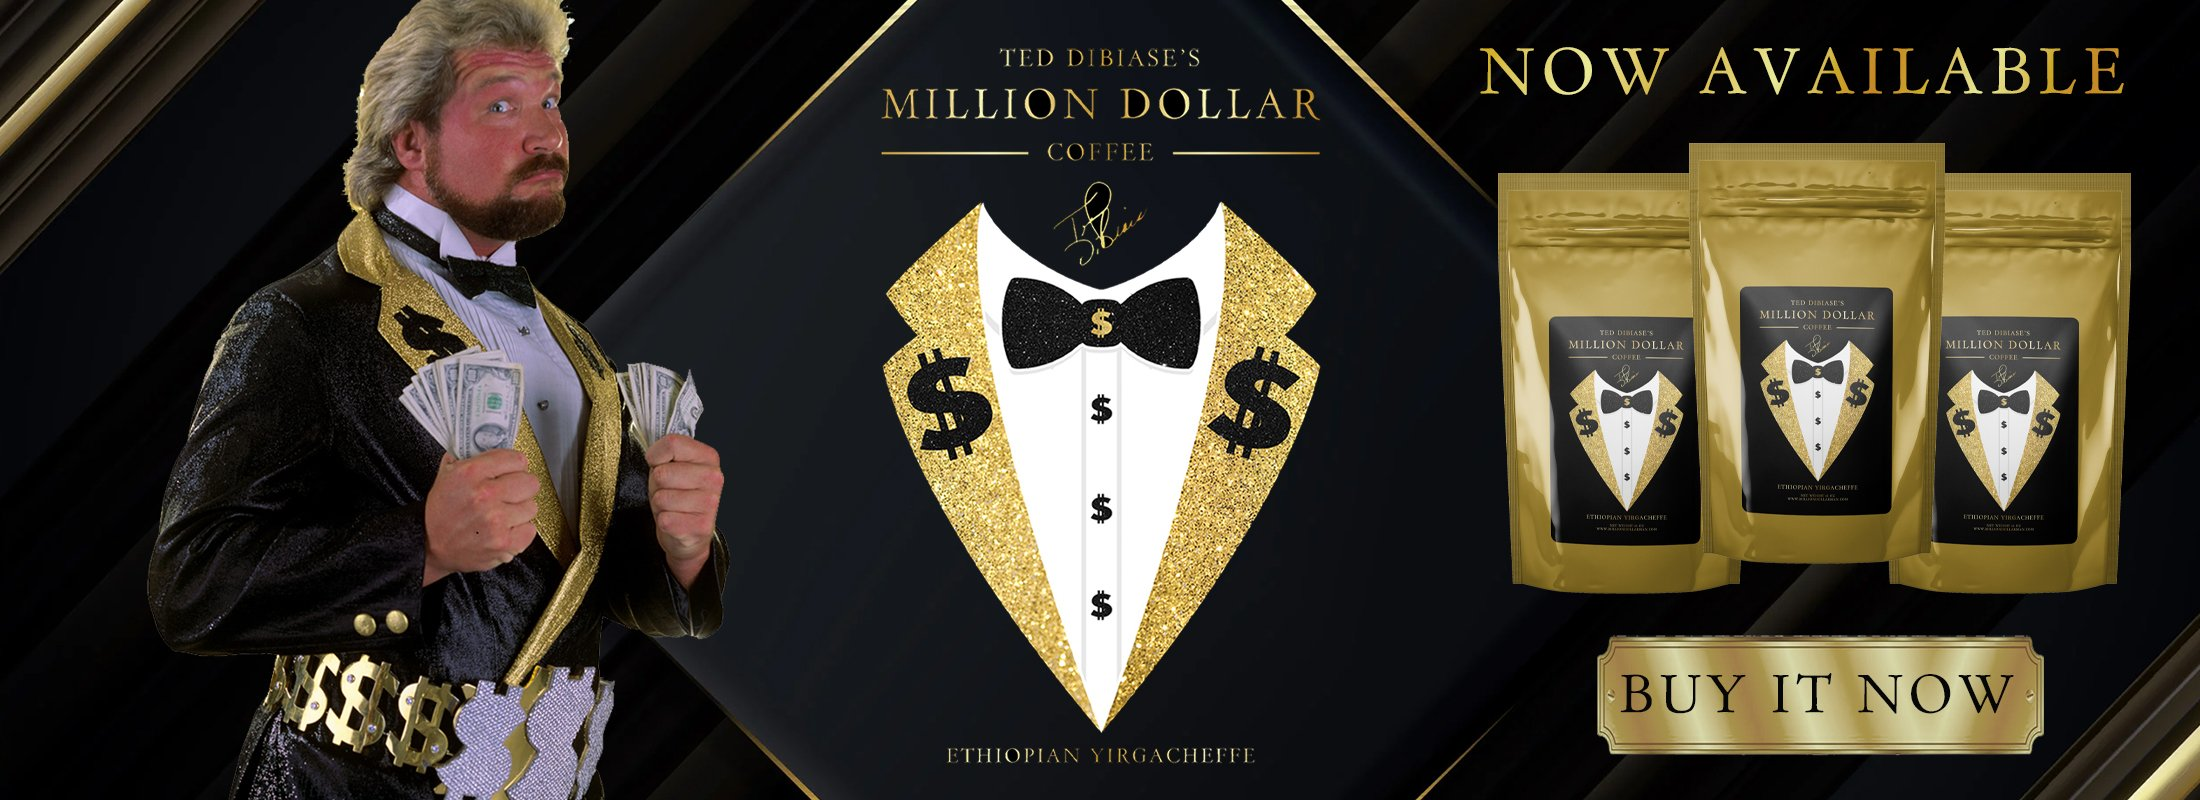 Ted Dibiase's Million Dollar Coffee